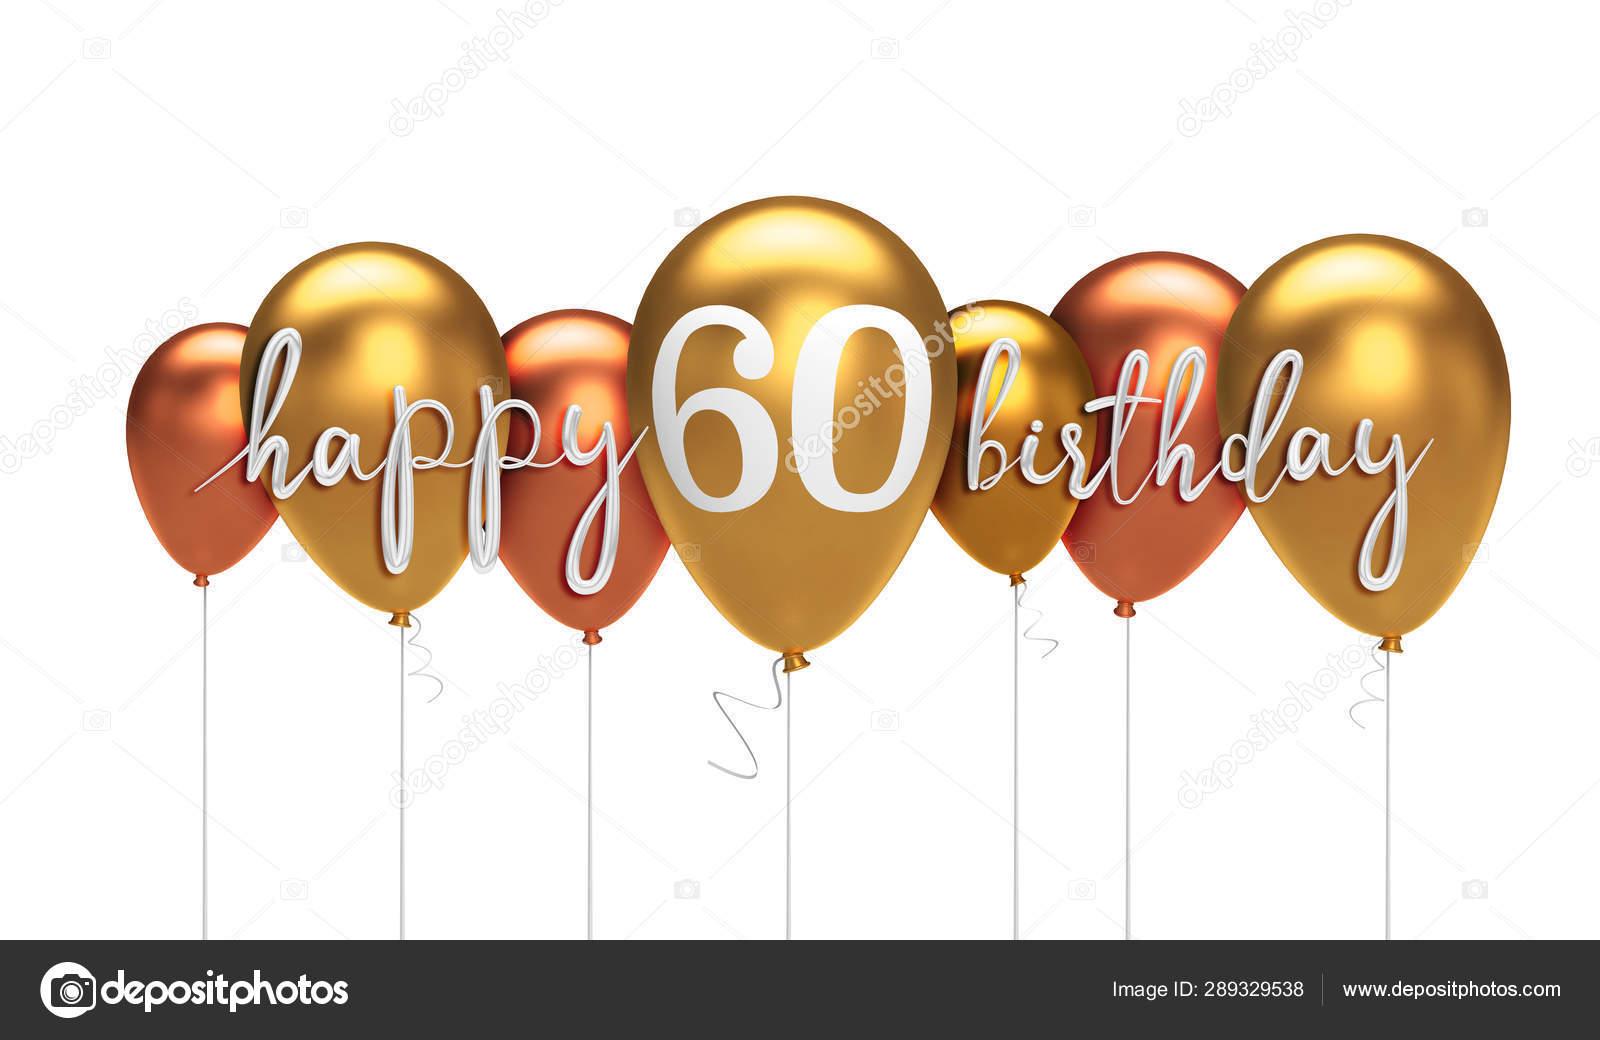 707 60th Birthday Stock Photos Free Royalty Free 60th Birthday Images Depositphotos